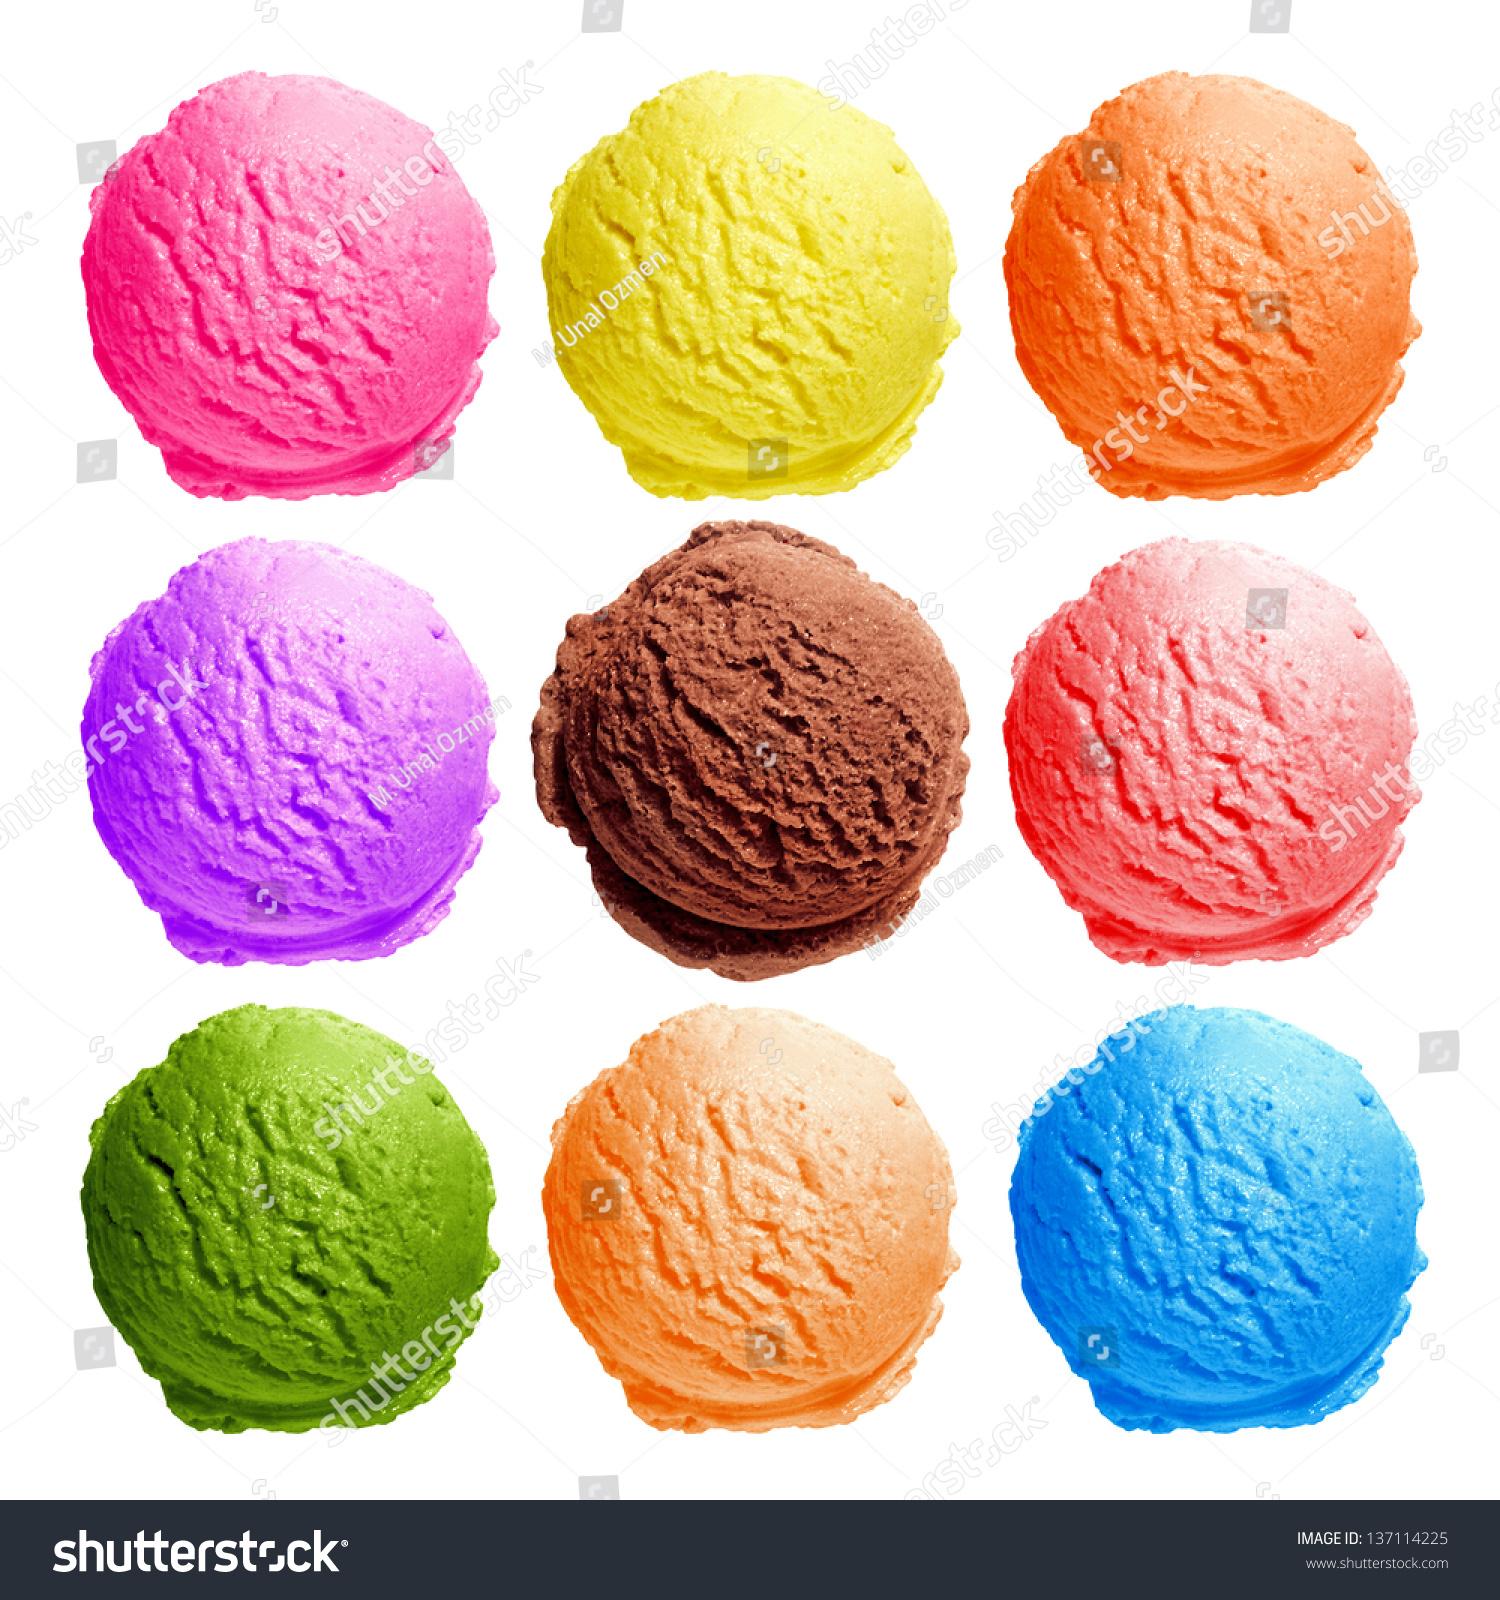 Popular Ice Cream Wallpaper Buy Cheap Ice Cream Wallpaper: Royalty-free Ice Cream Scoops Top View Isolated On